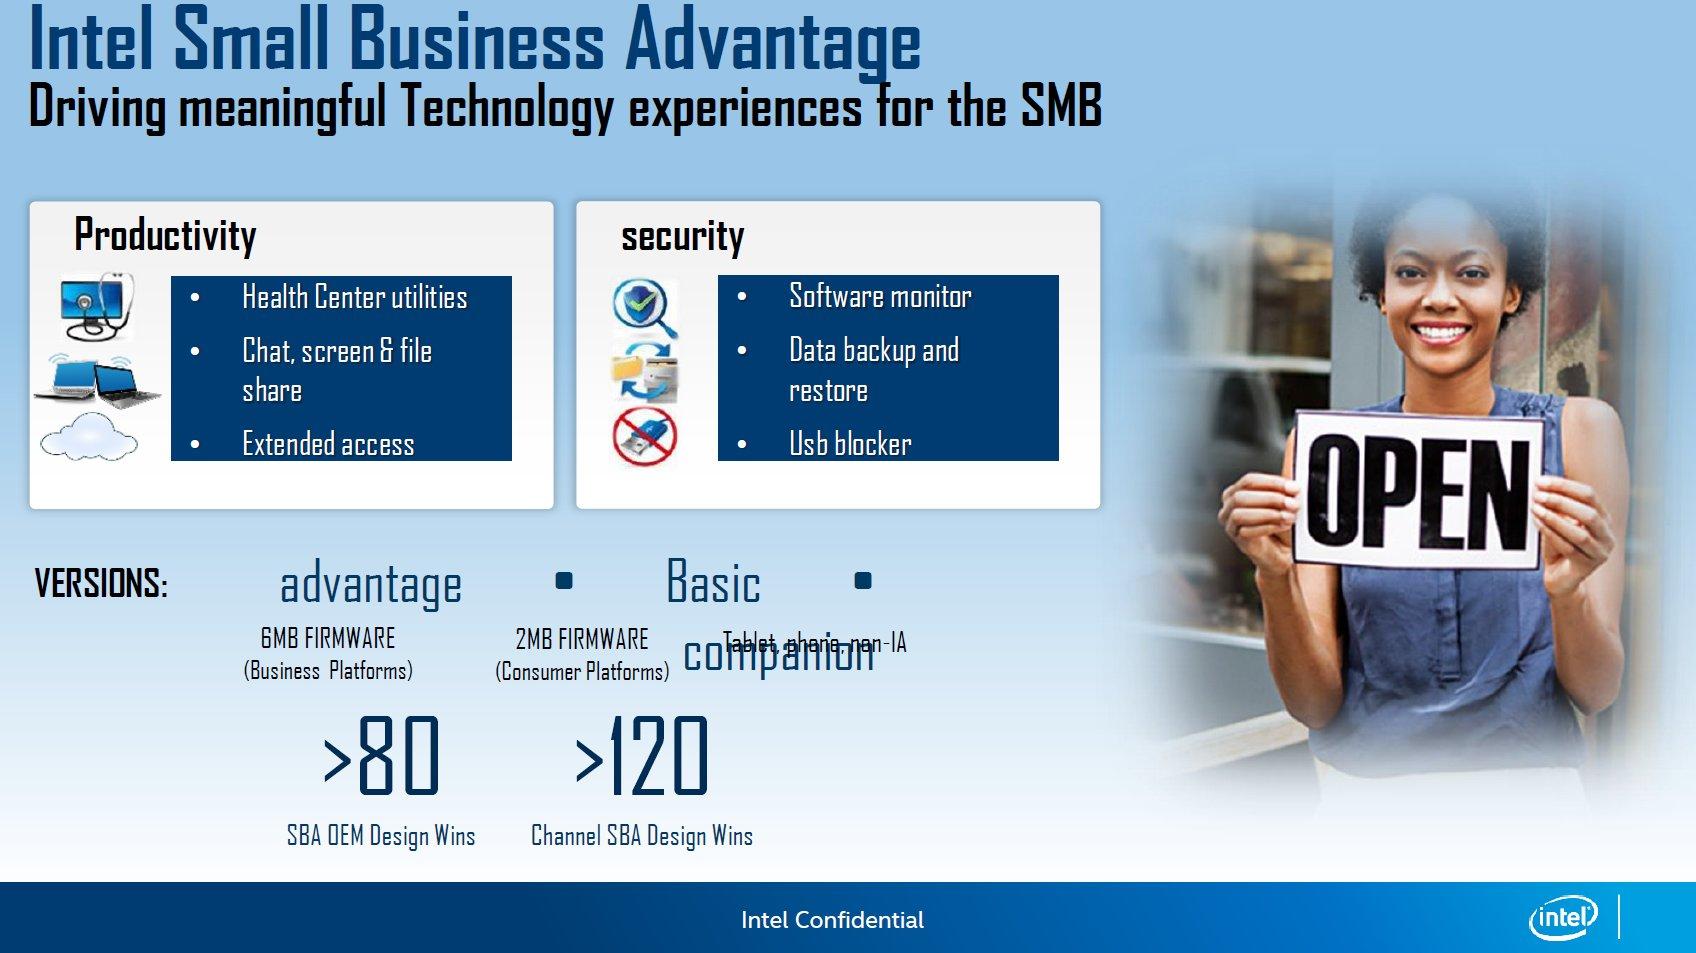 Intel Small Business Advantage